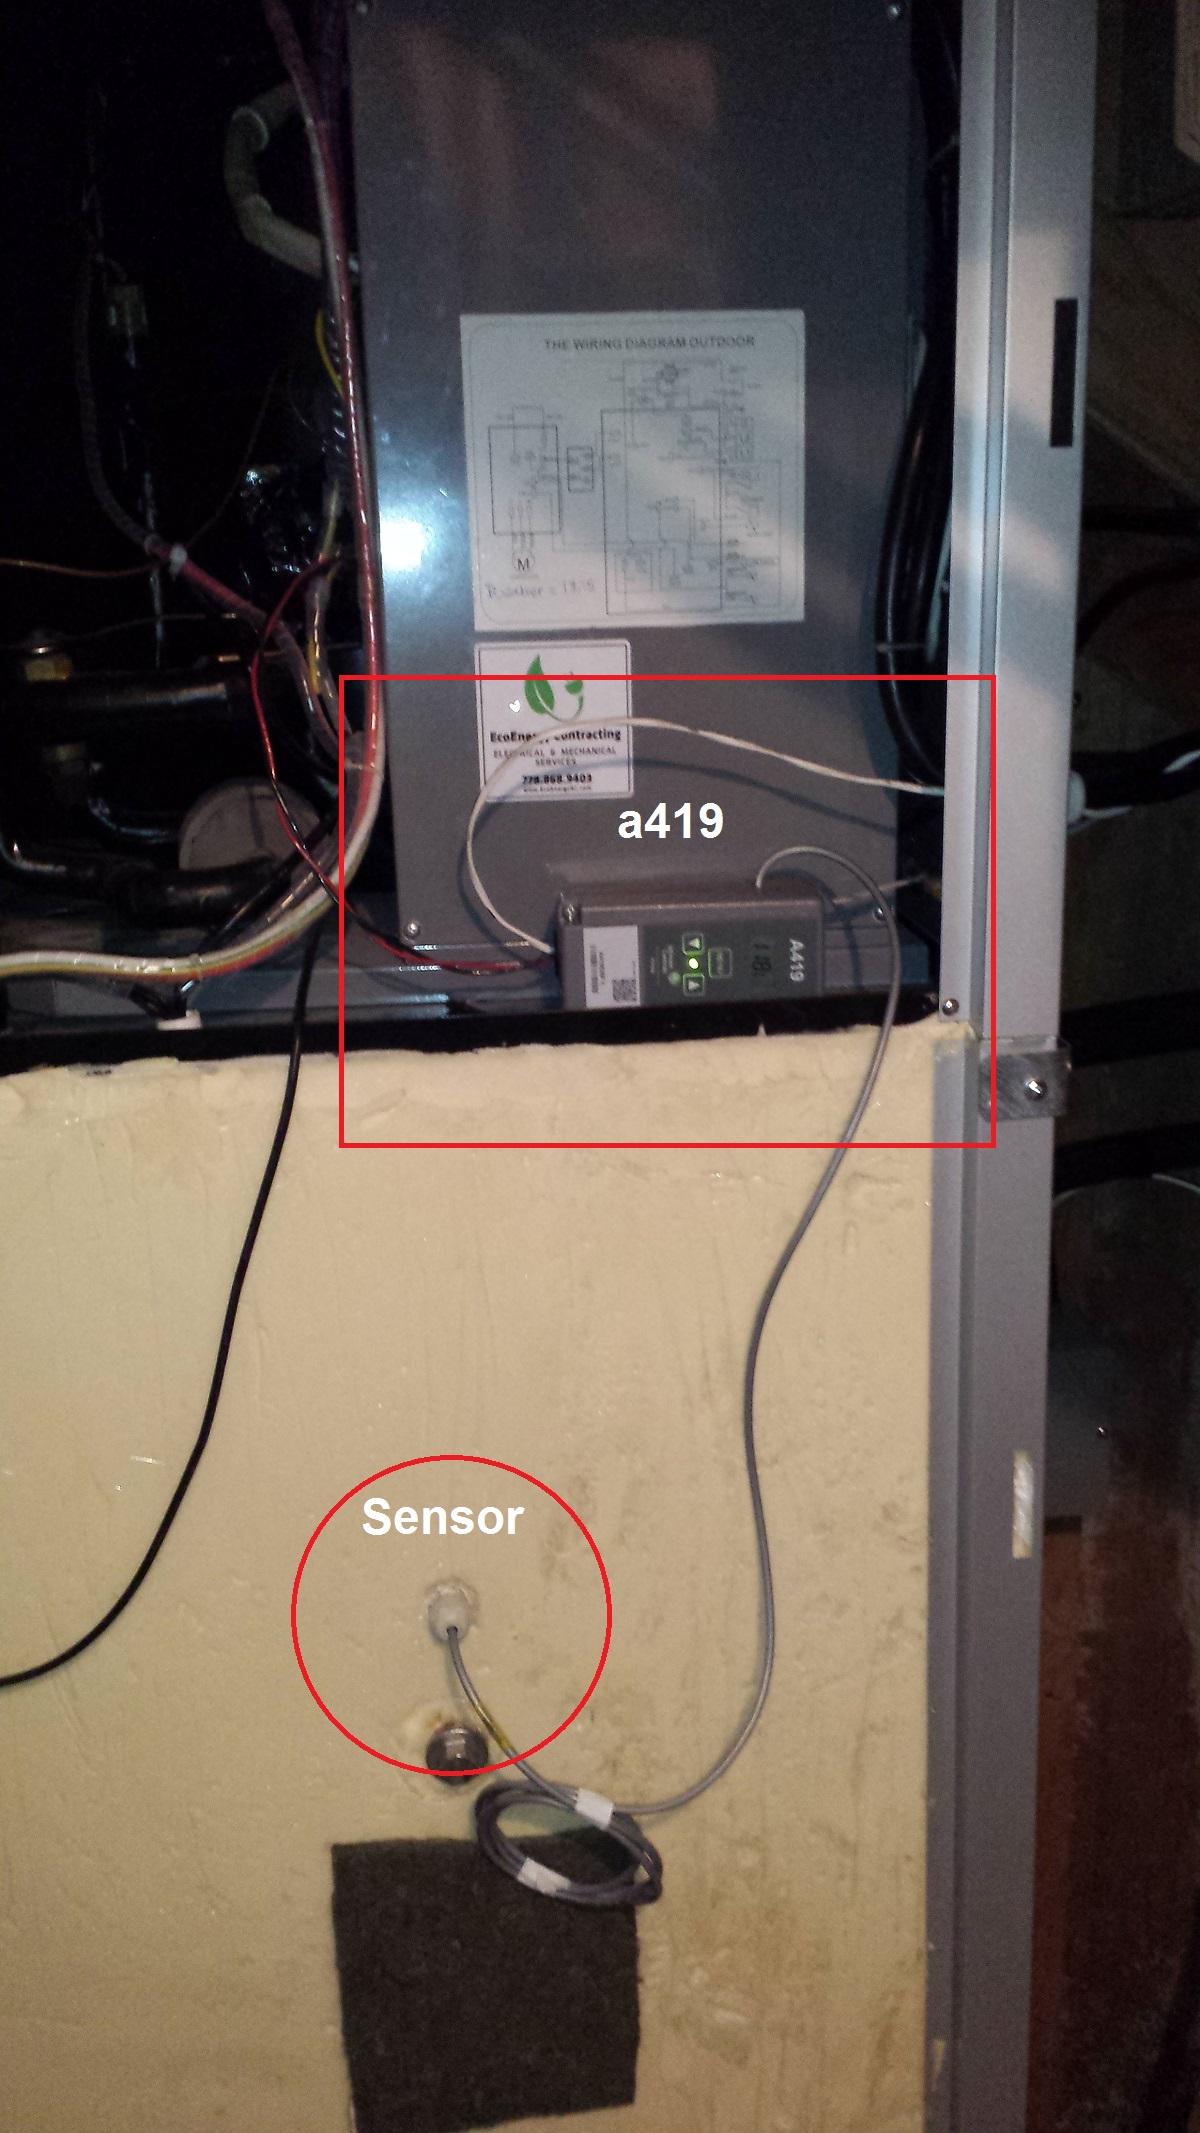 johnson controls a419 wiring diagram ac motor capacitor johnston digital aquastat sunpump